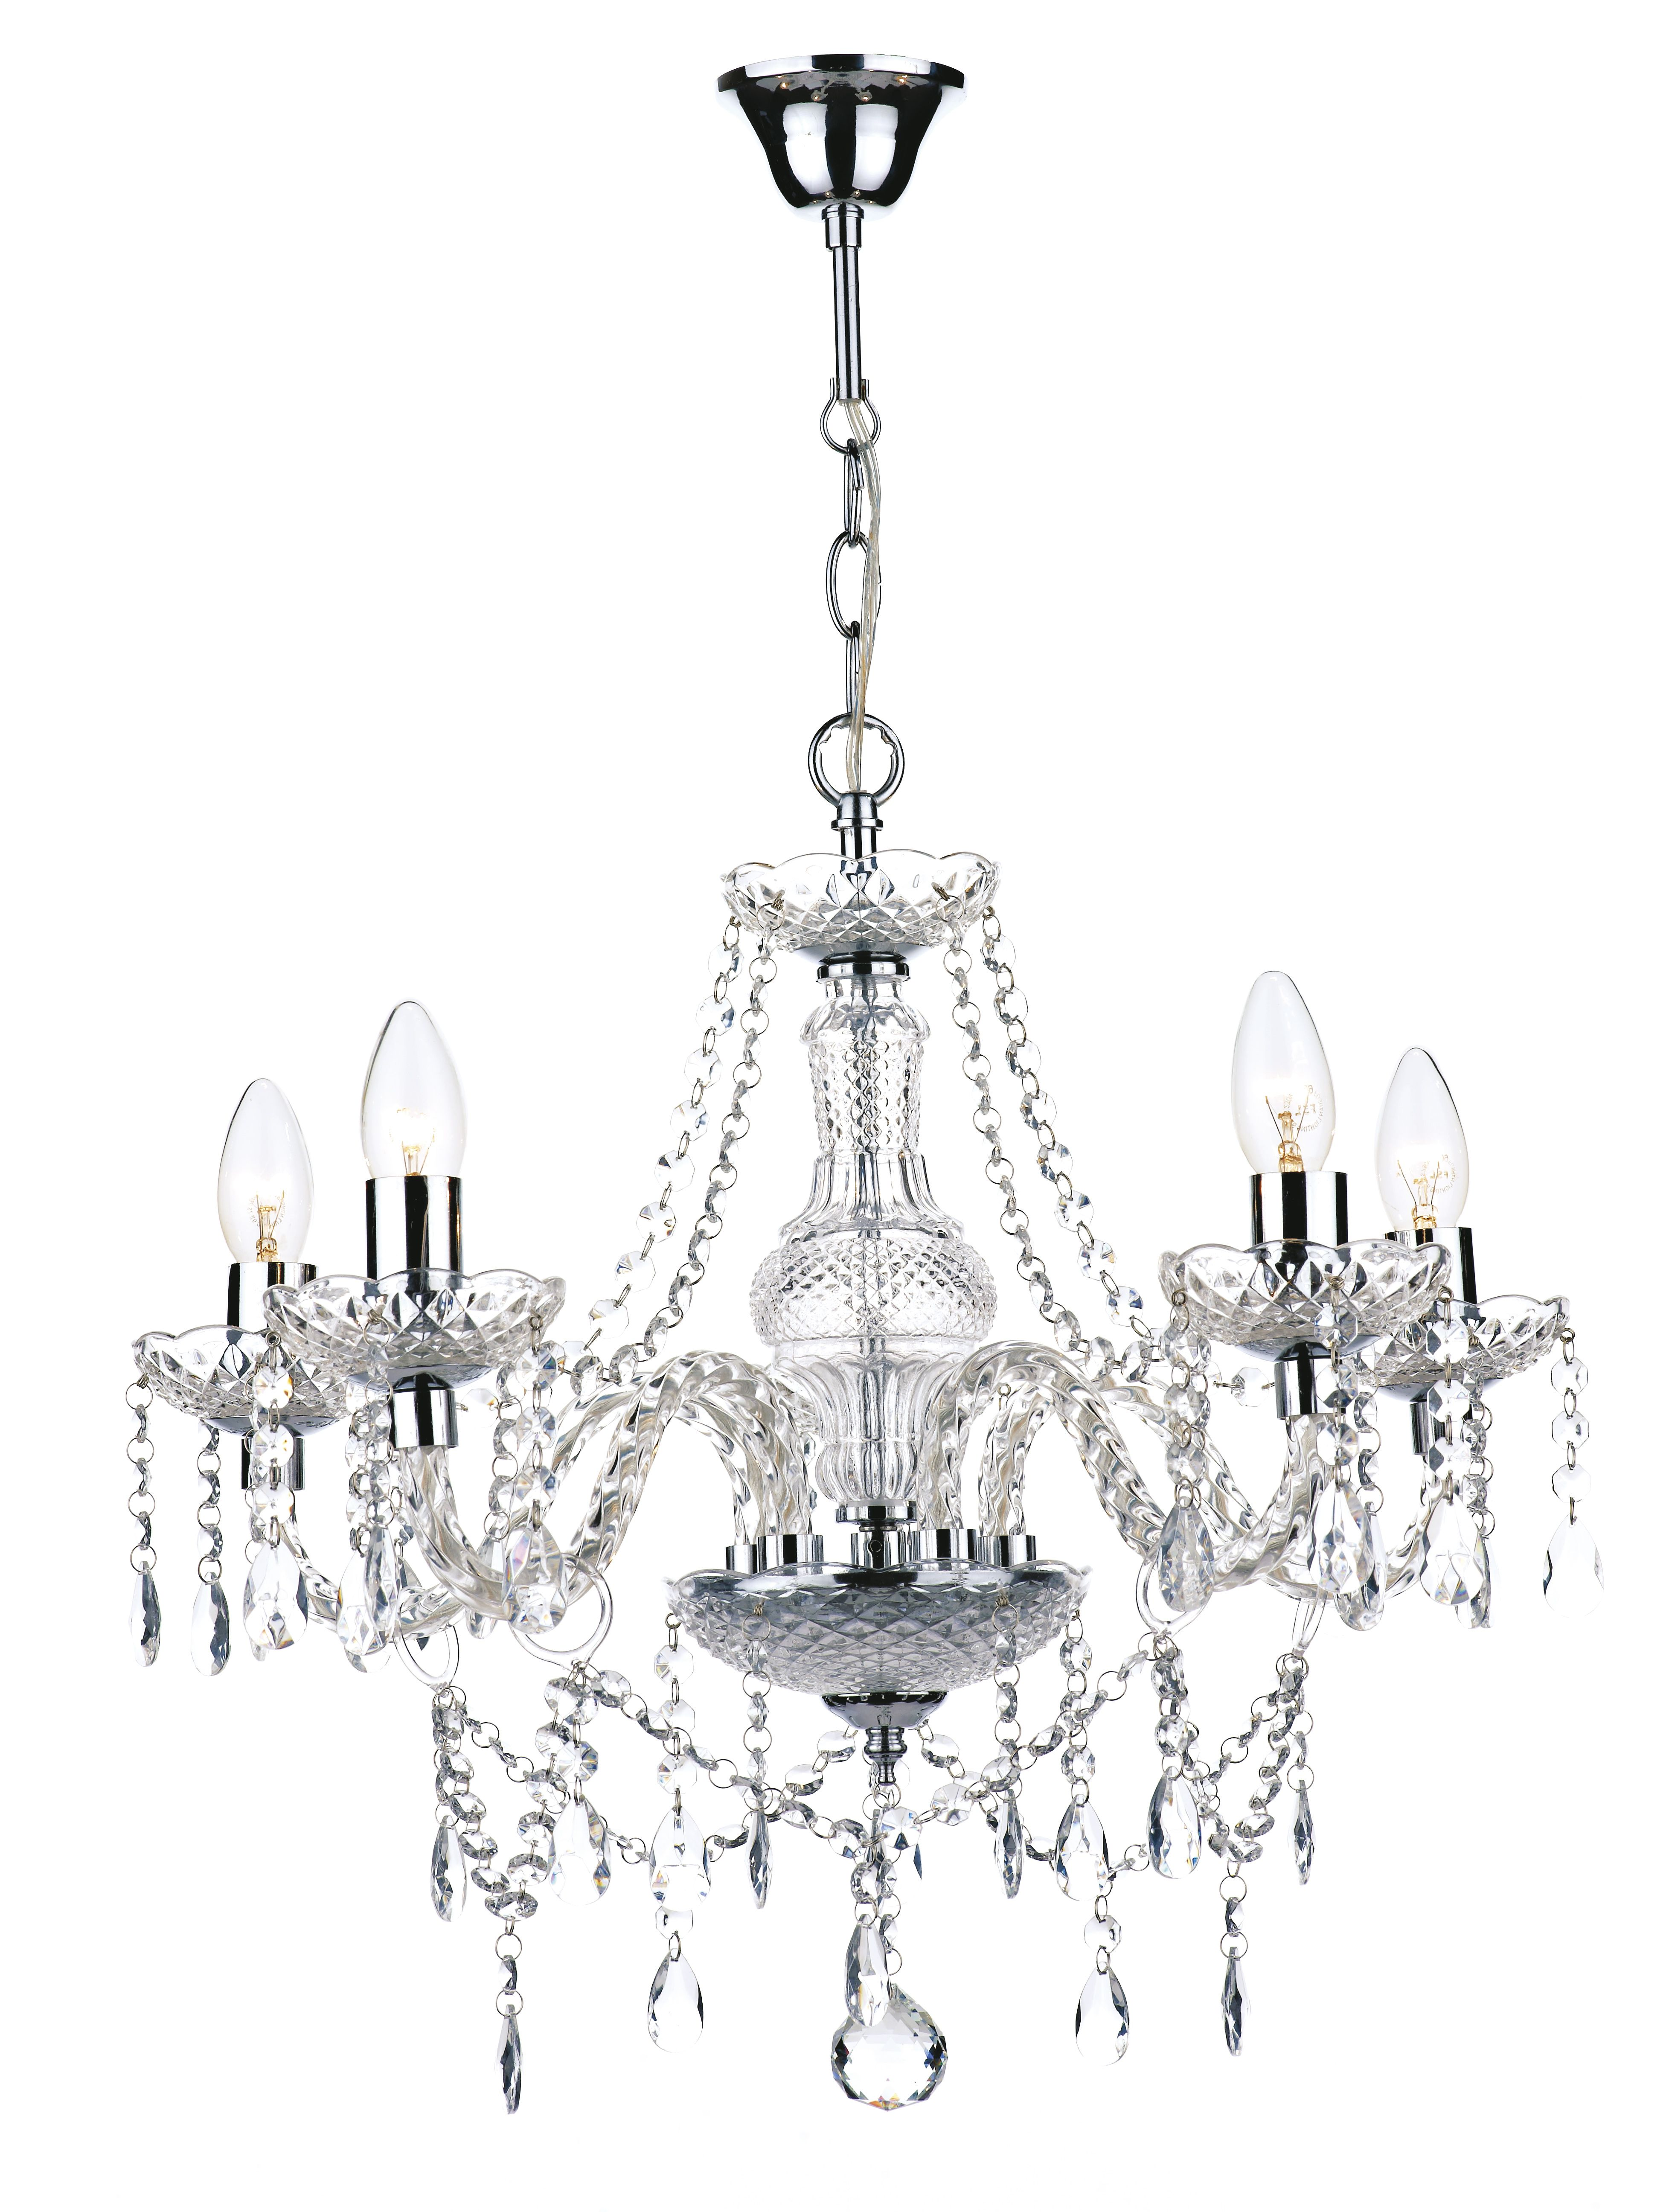 5 light polished chrome crystal chandelier 205 thornhill malone 5 light polished chrome crystal chandelier 205 arubaitofo Images